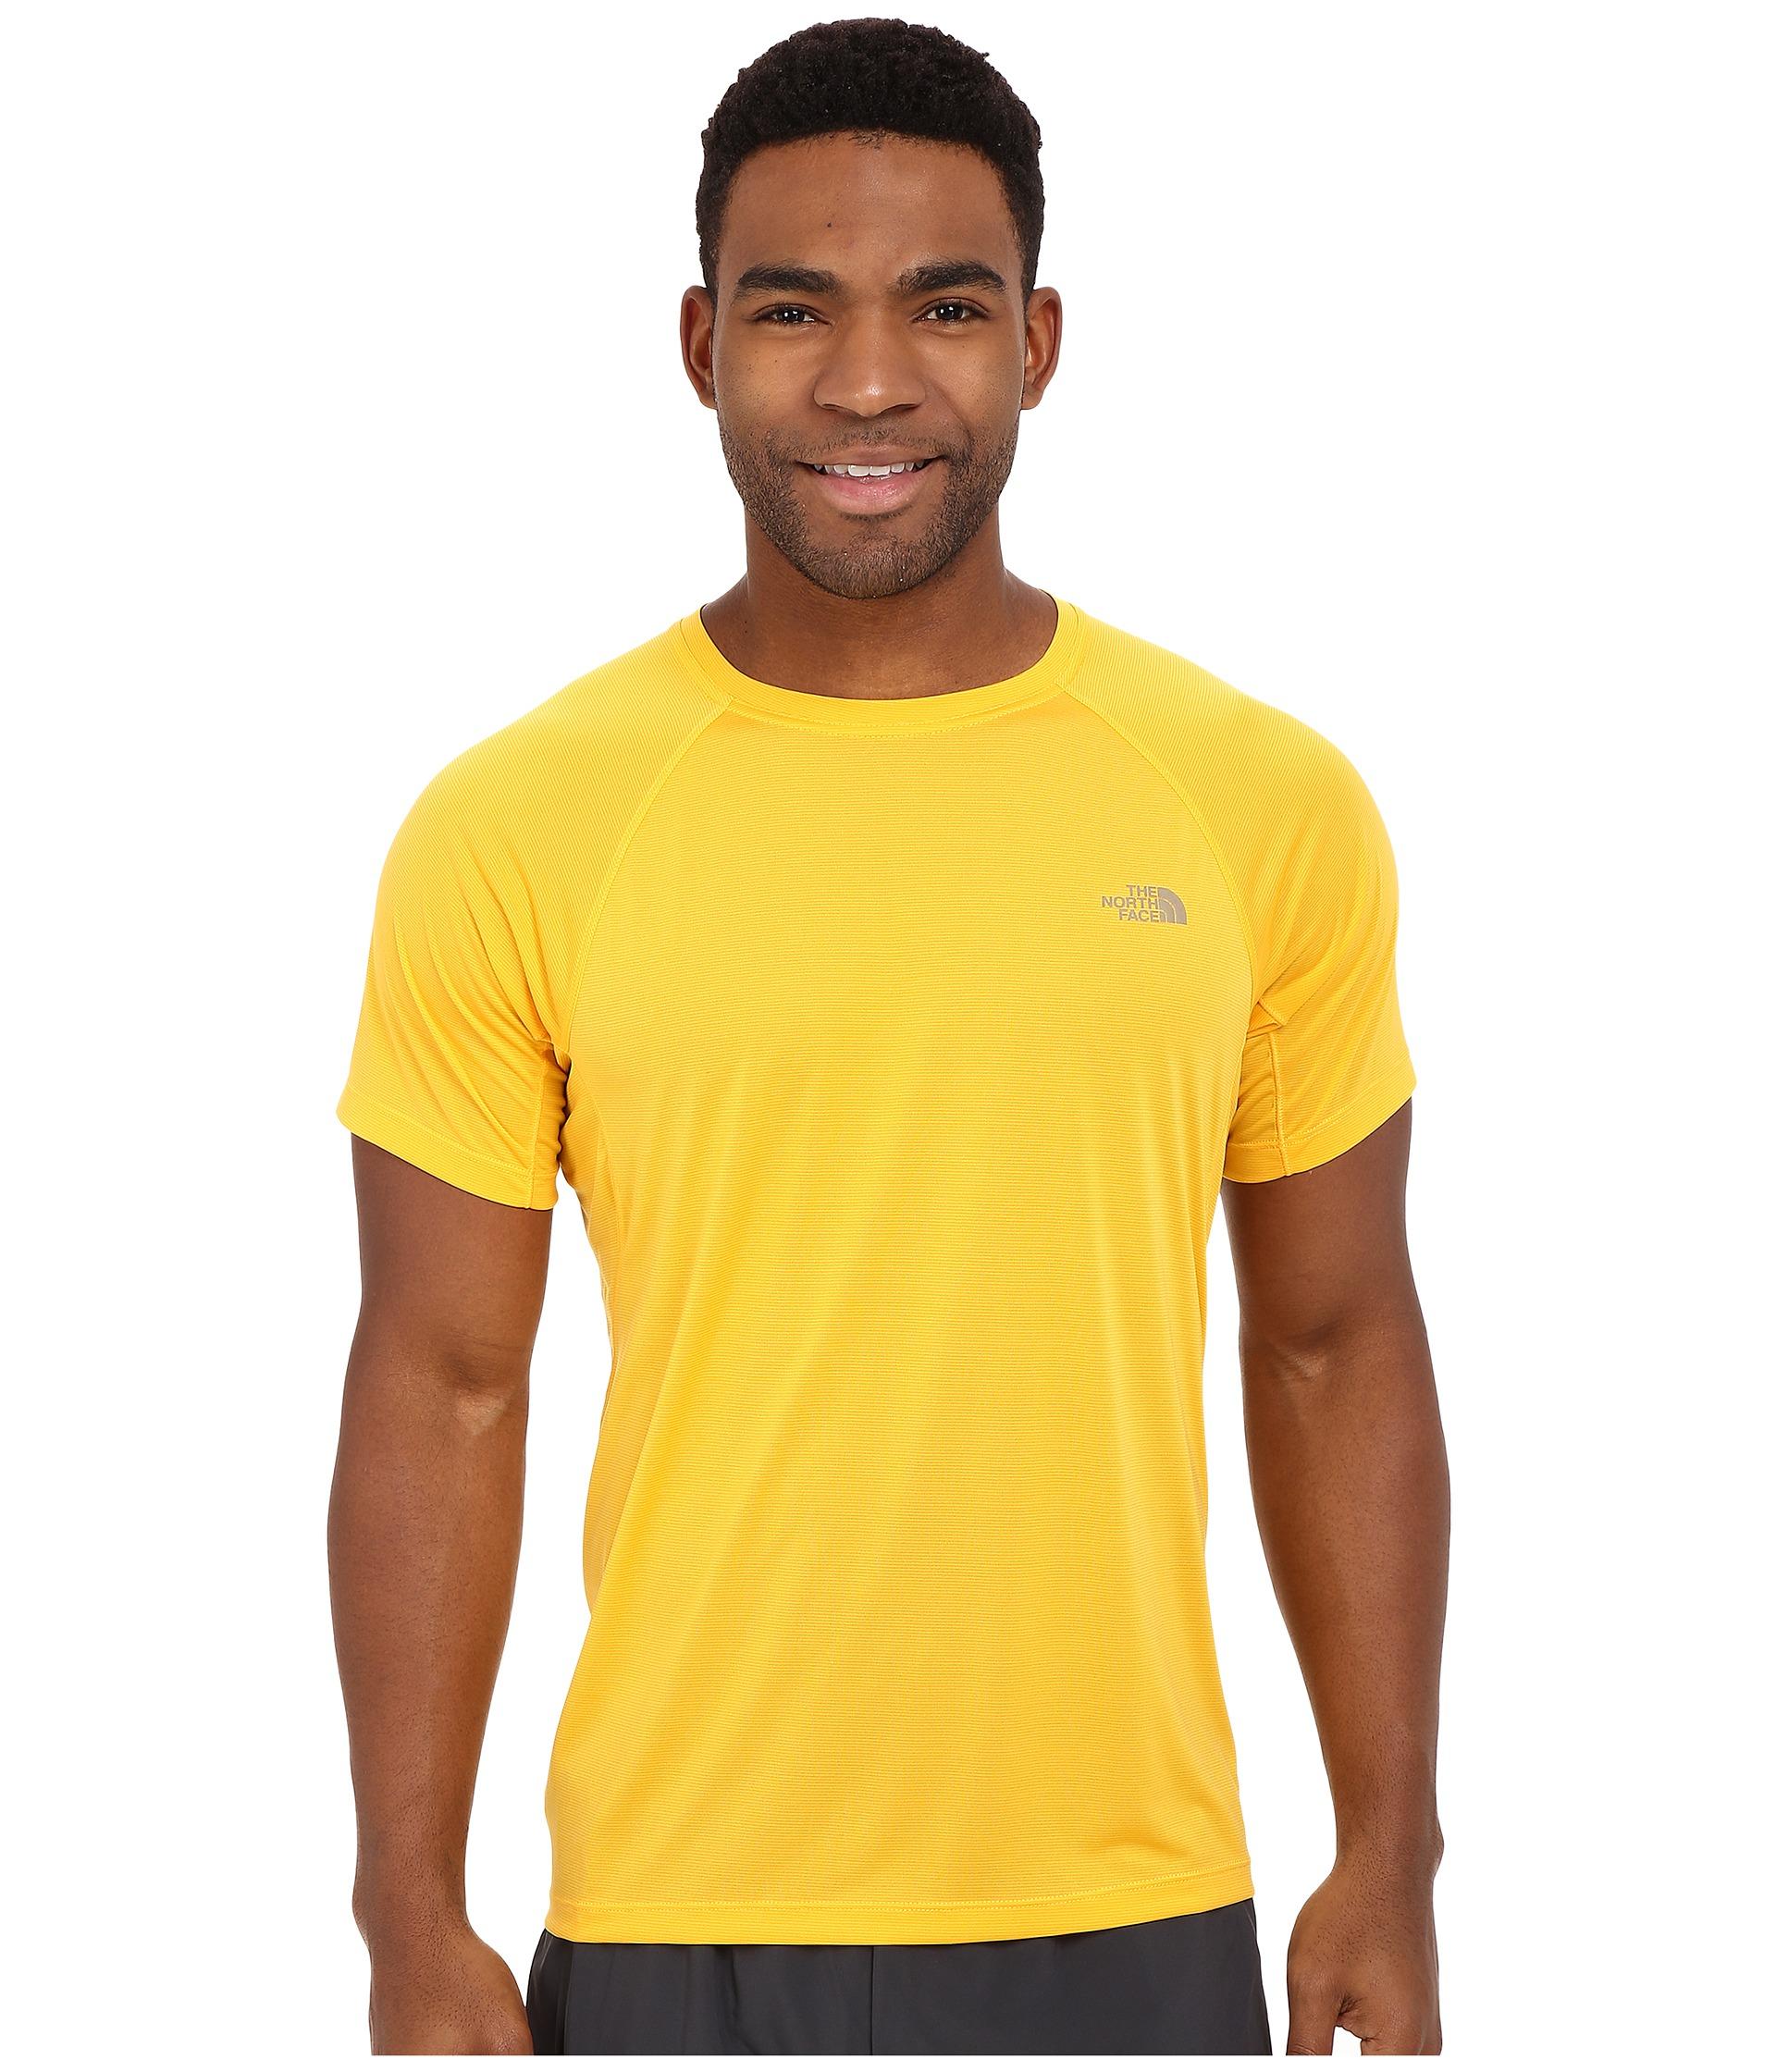 f298122b6 Men's Yellow Better Than Naked™ Short Sleeve Shirt